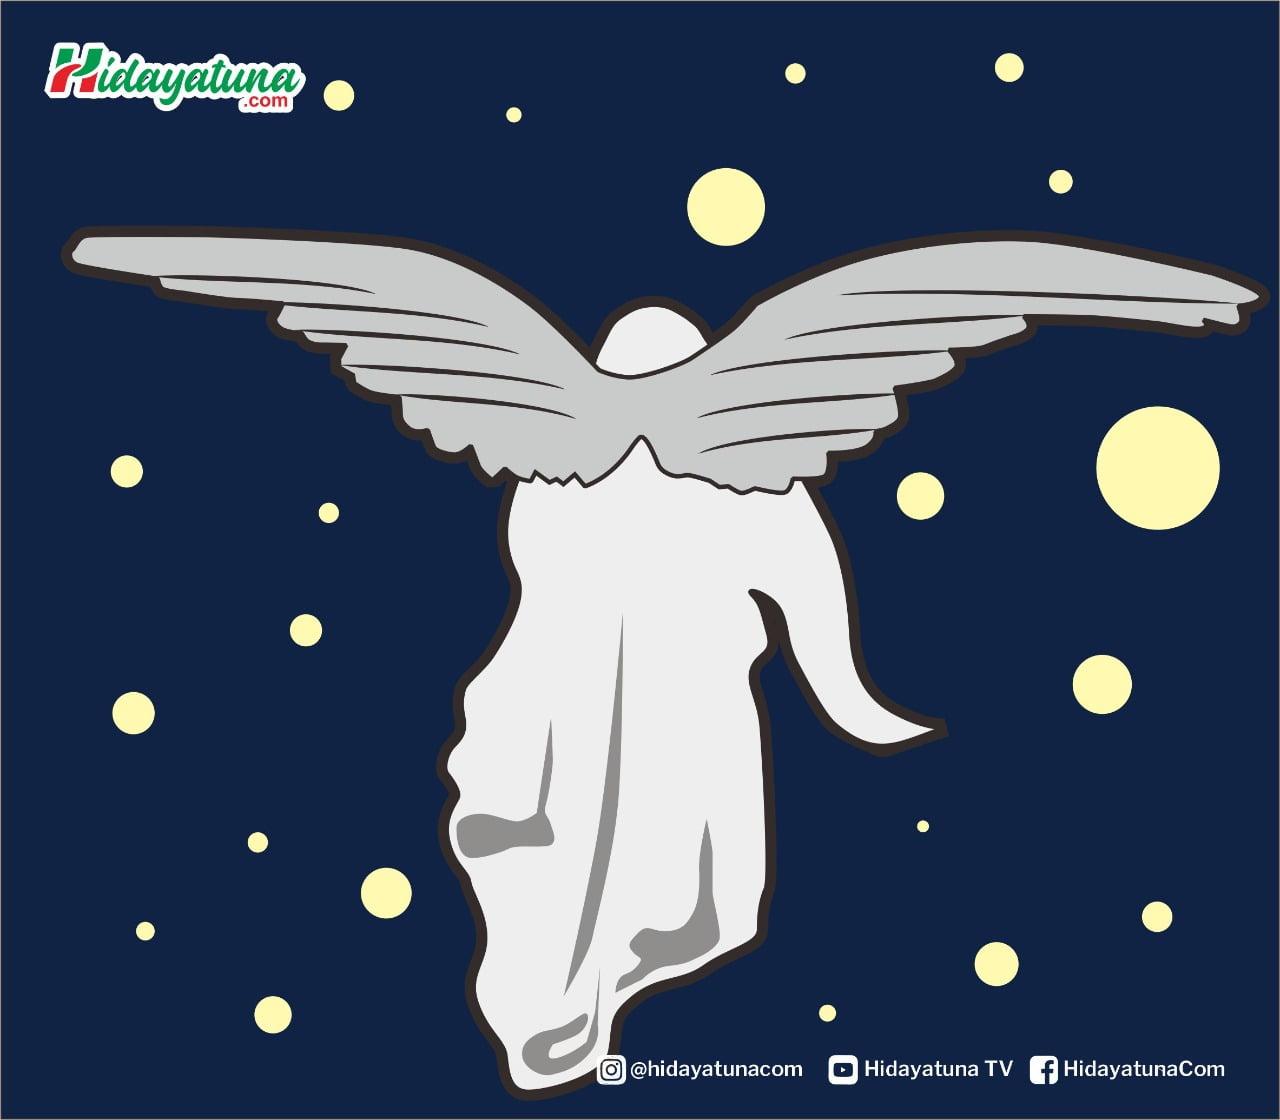 Malaikat Penjaga Neraka (Ilustrasi/Hidayatuna)